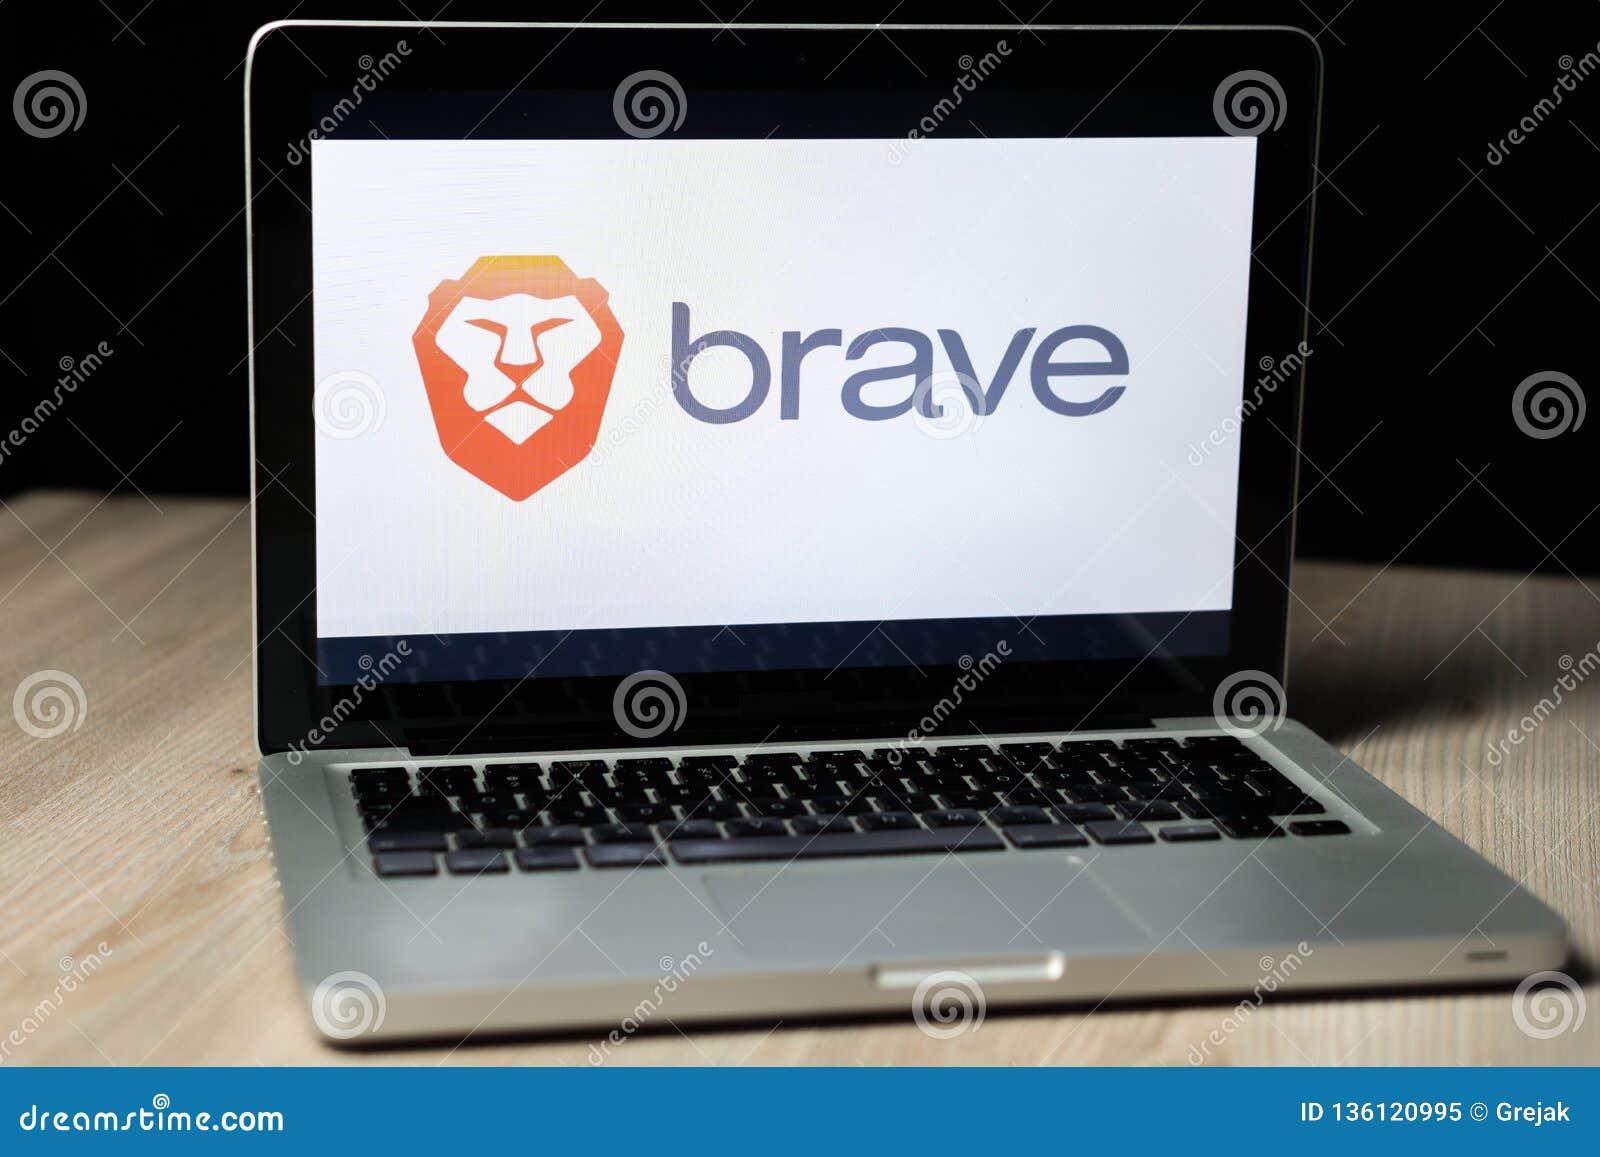 Brave Browser Logo On A Laptop Screen, Slovenia - December 23th